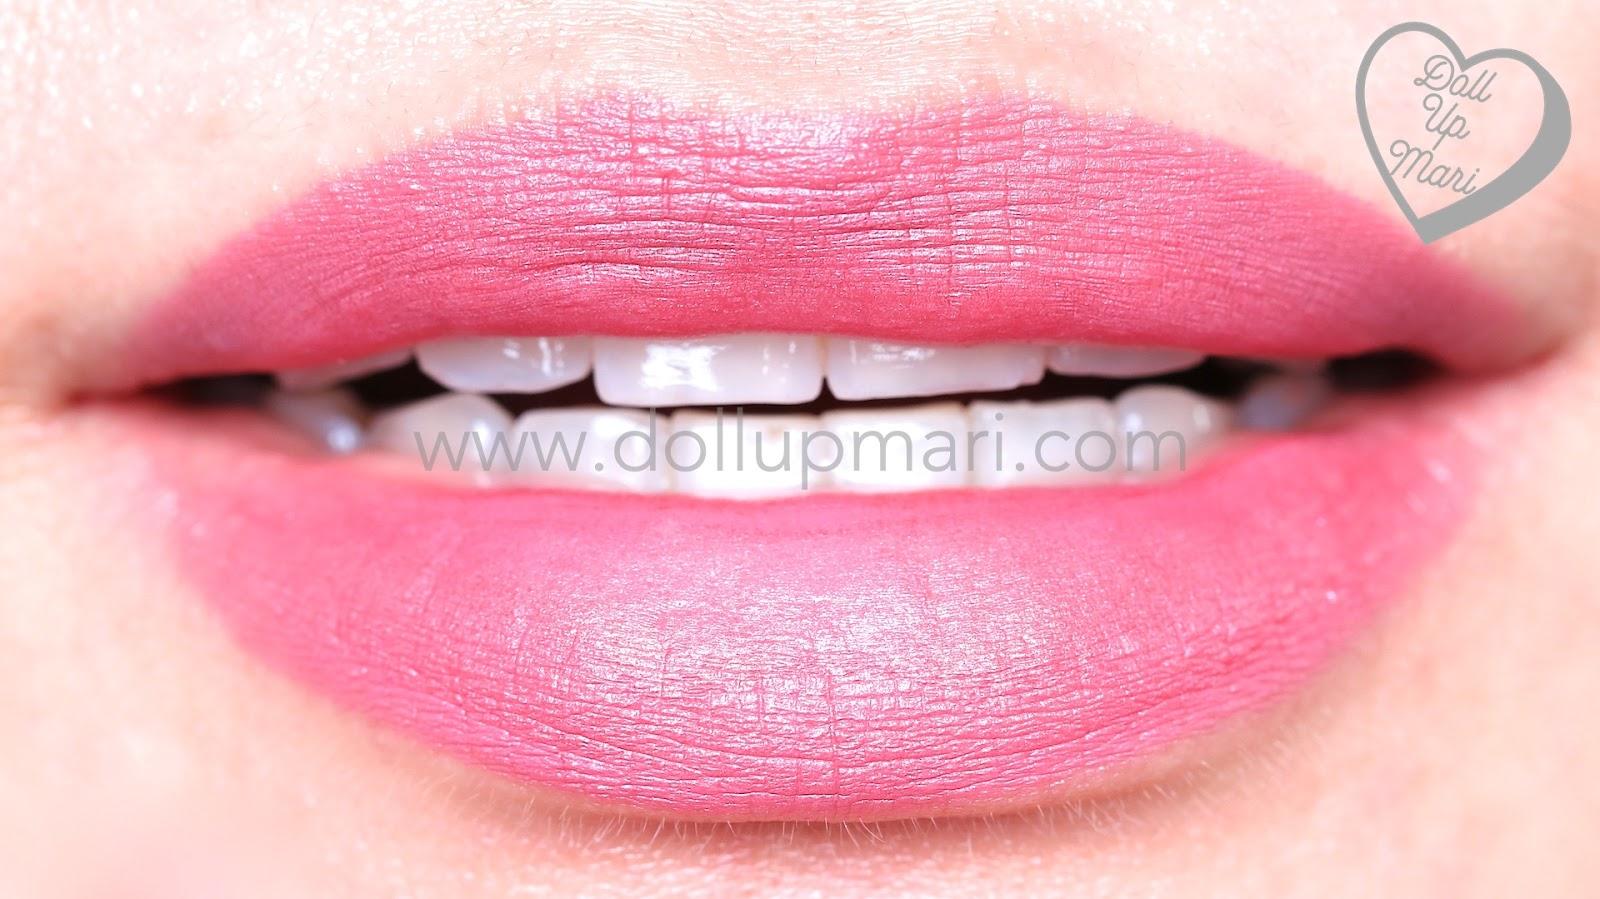 lip swatch of Silkygirl OMG! Powder Matte Lipcolor Lipstick (03-Mulberry)